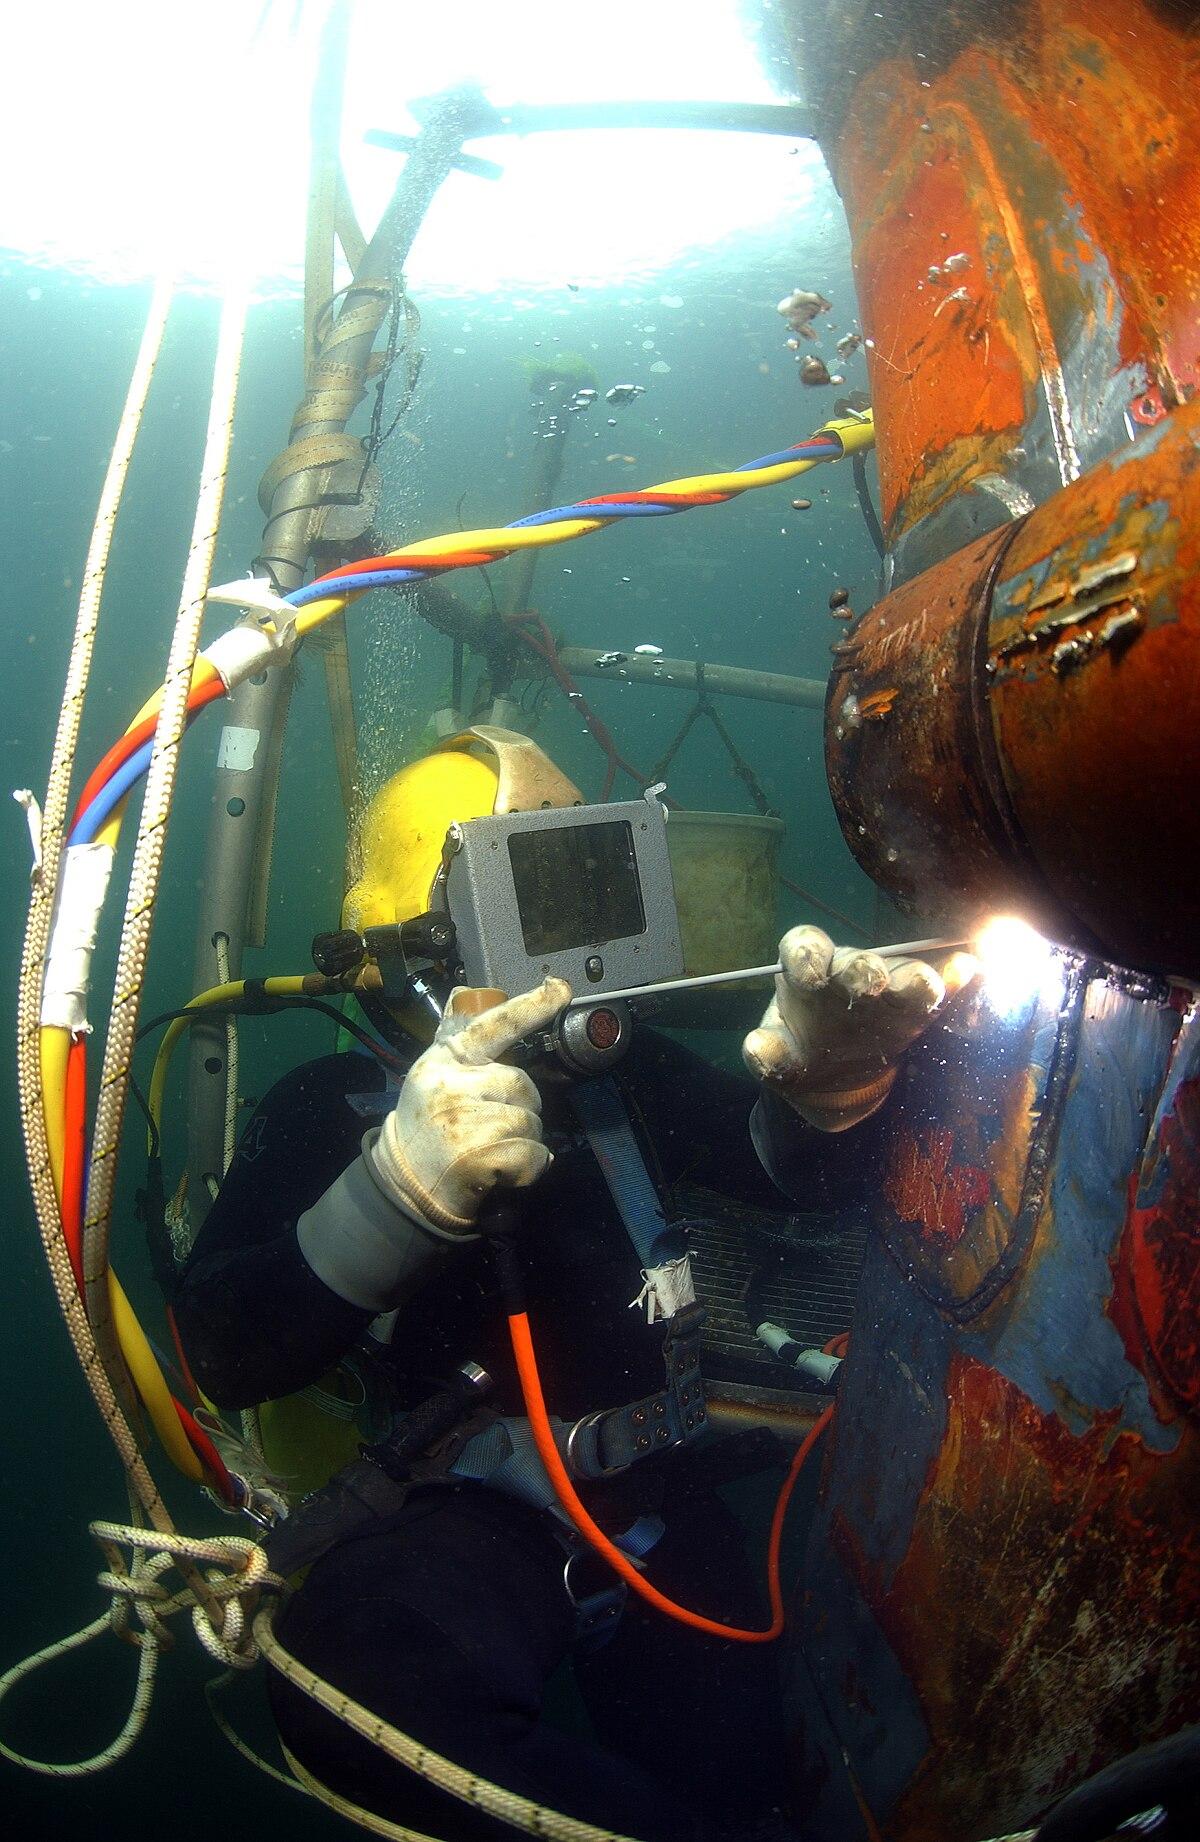 Commercial Diving Career & Salary As An Underwater Welder - Careers underwater welding